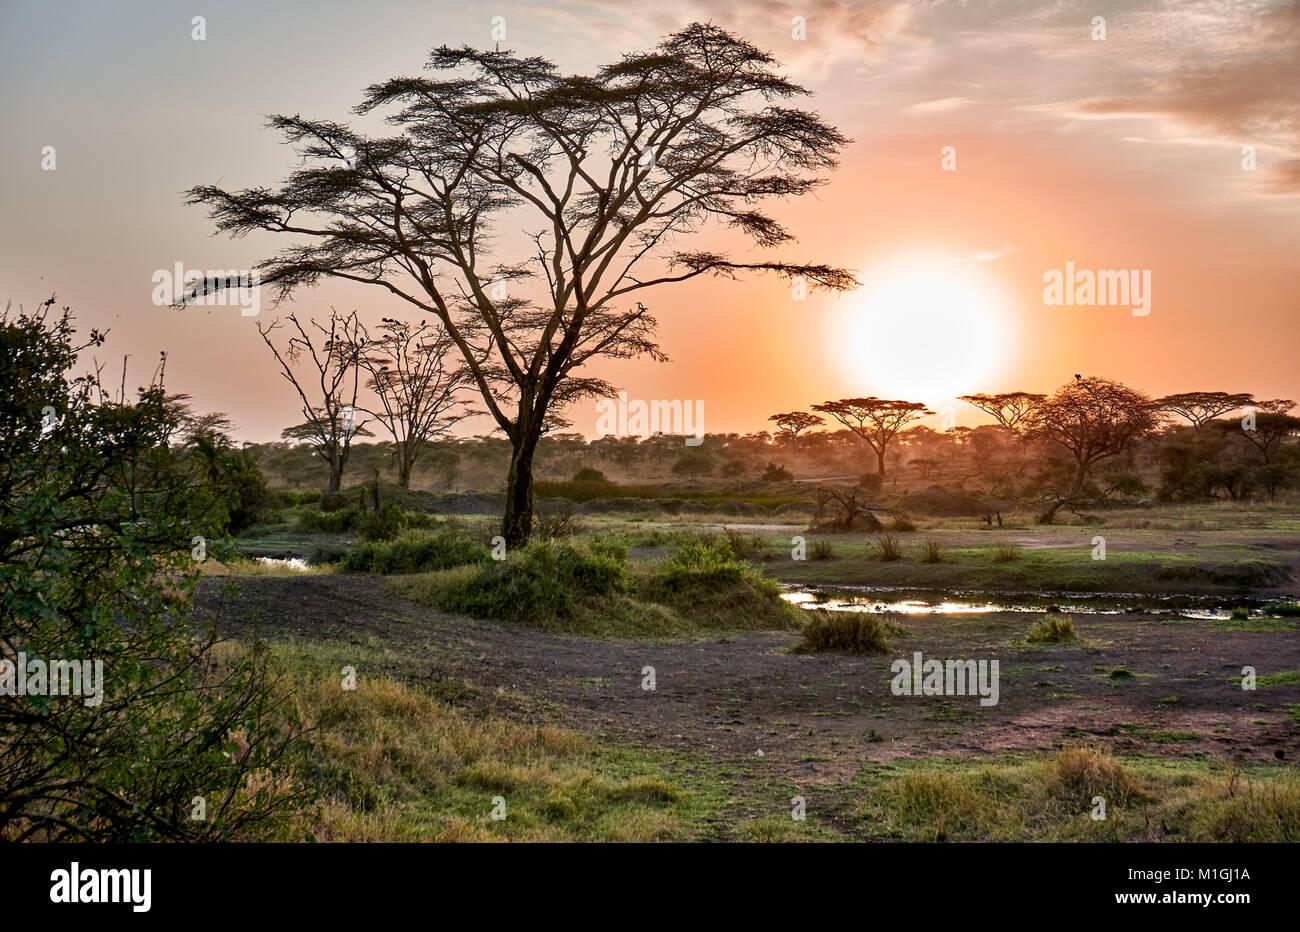 sunrise in Serengeti National Park, UNESCO world heritage site, Tanzania, Africa Stock Photo